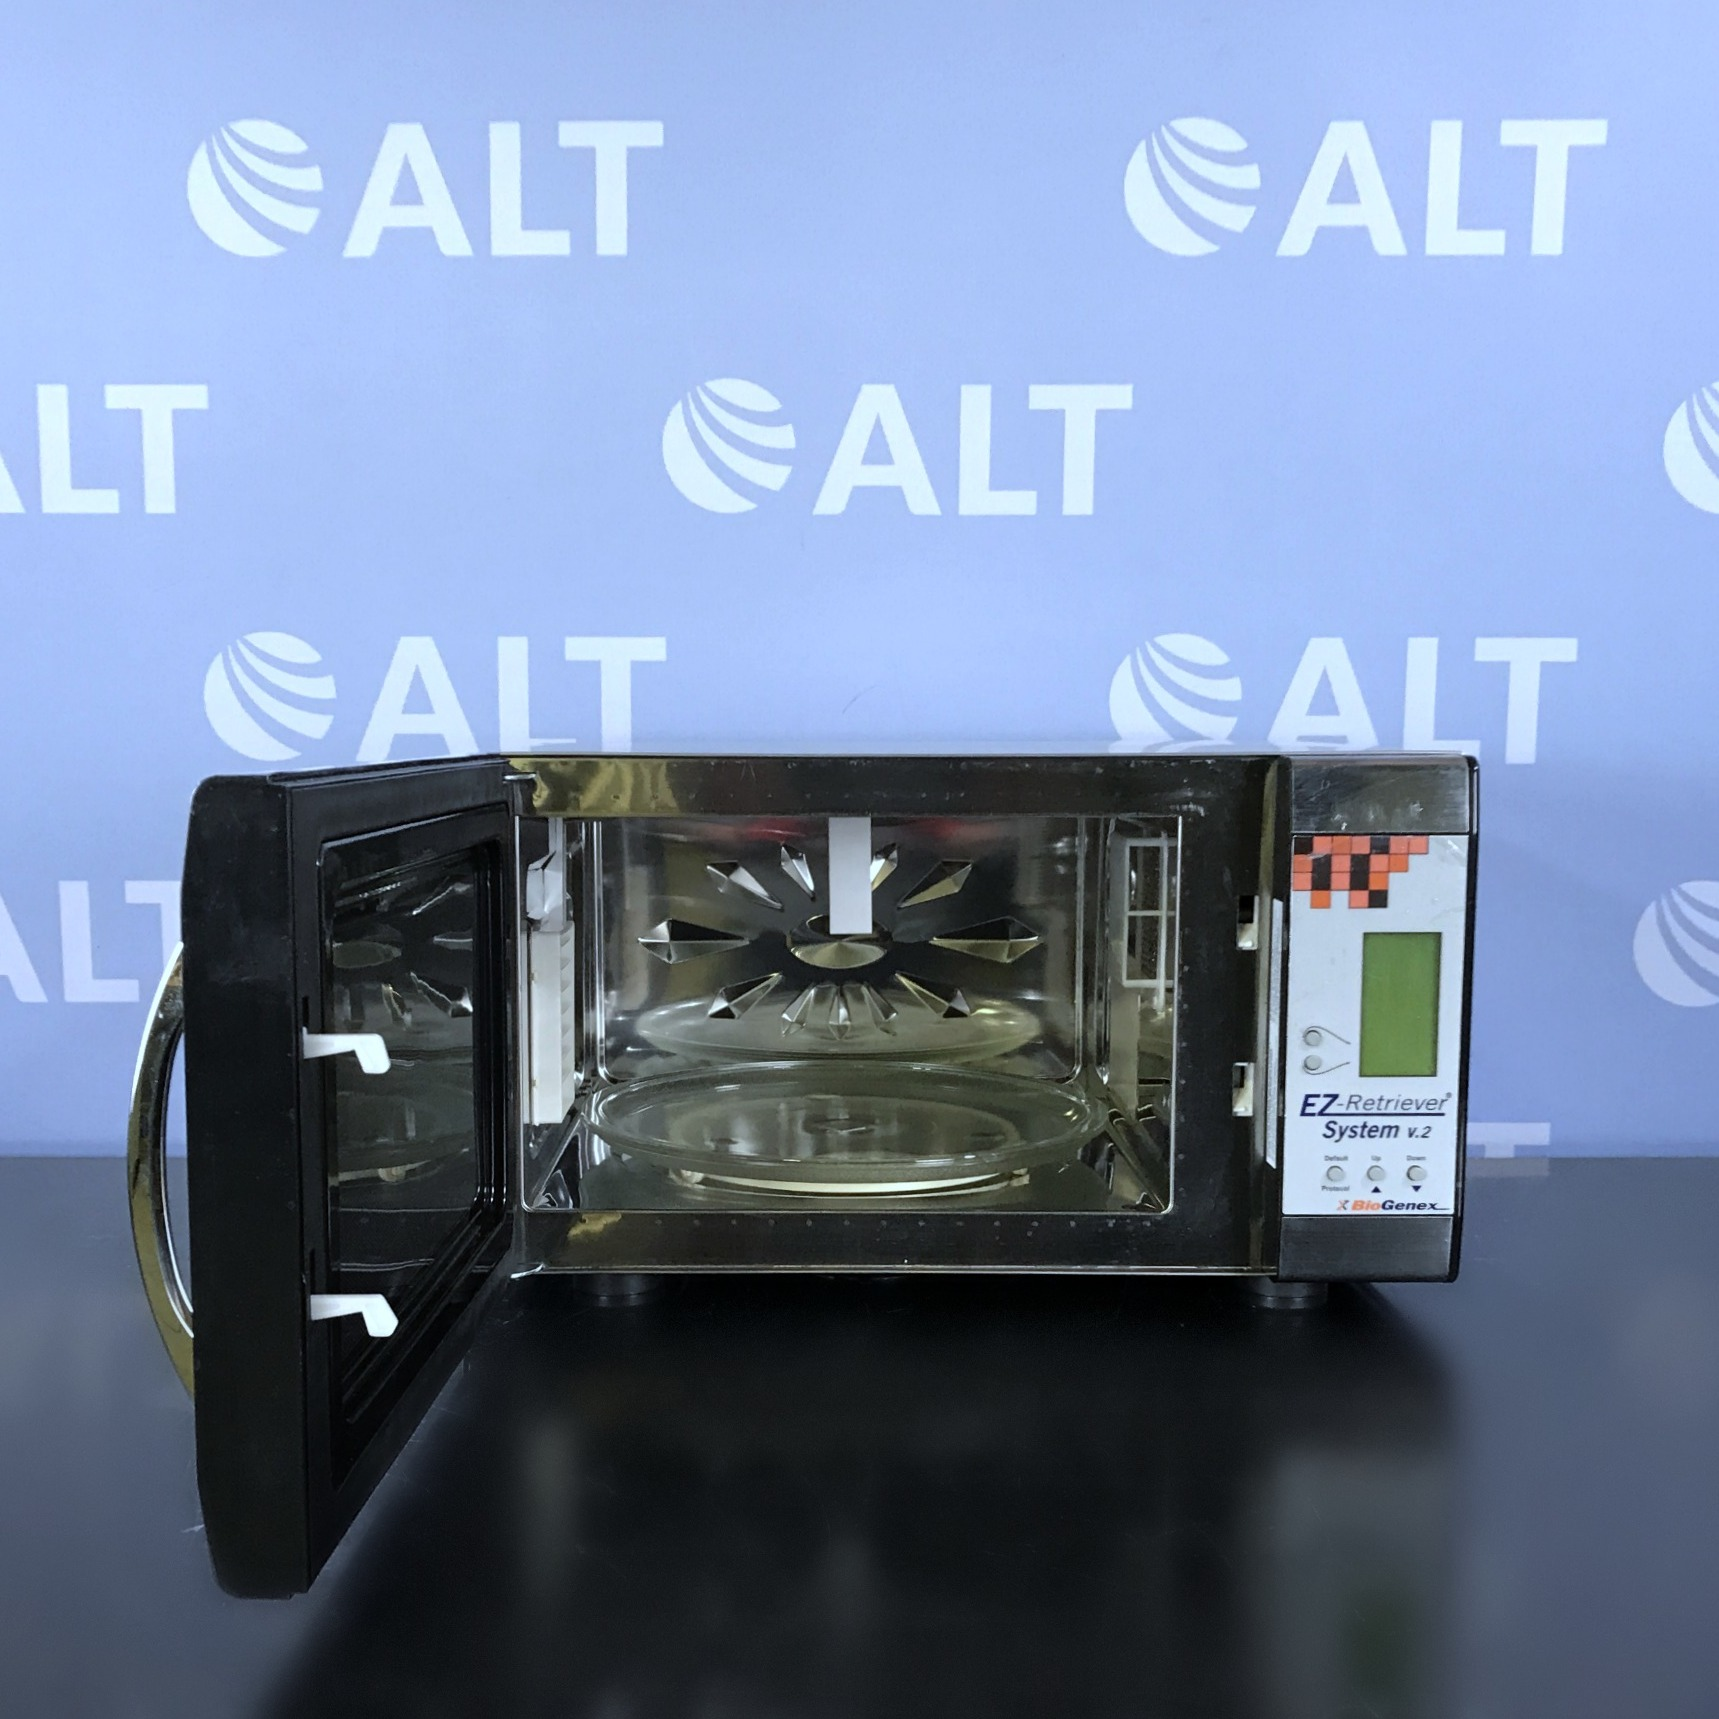 BioGenex EZ-Retriever System V.2 Microwave Oven Model EZ-RT-110.V2 Image